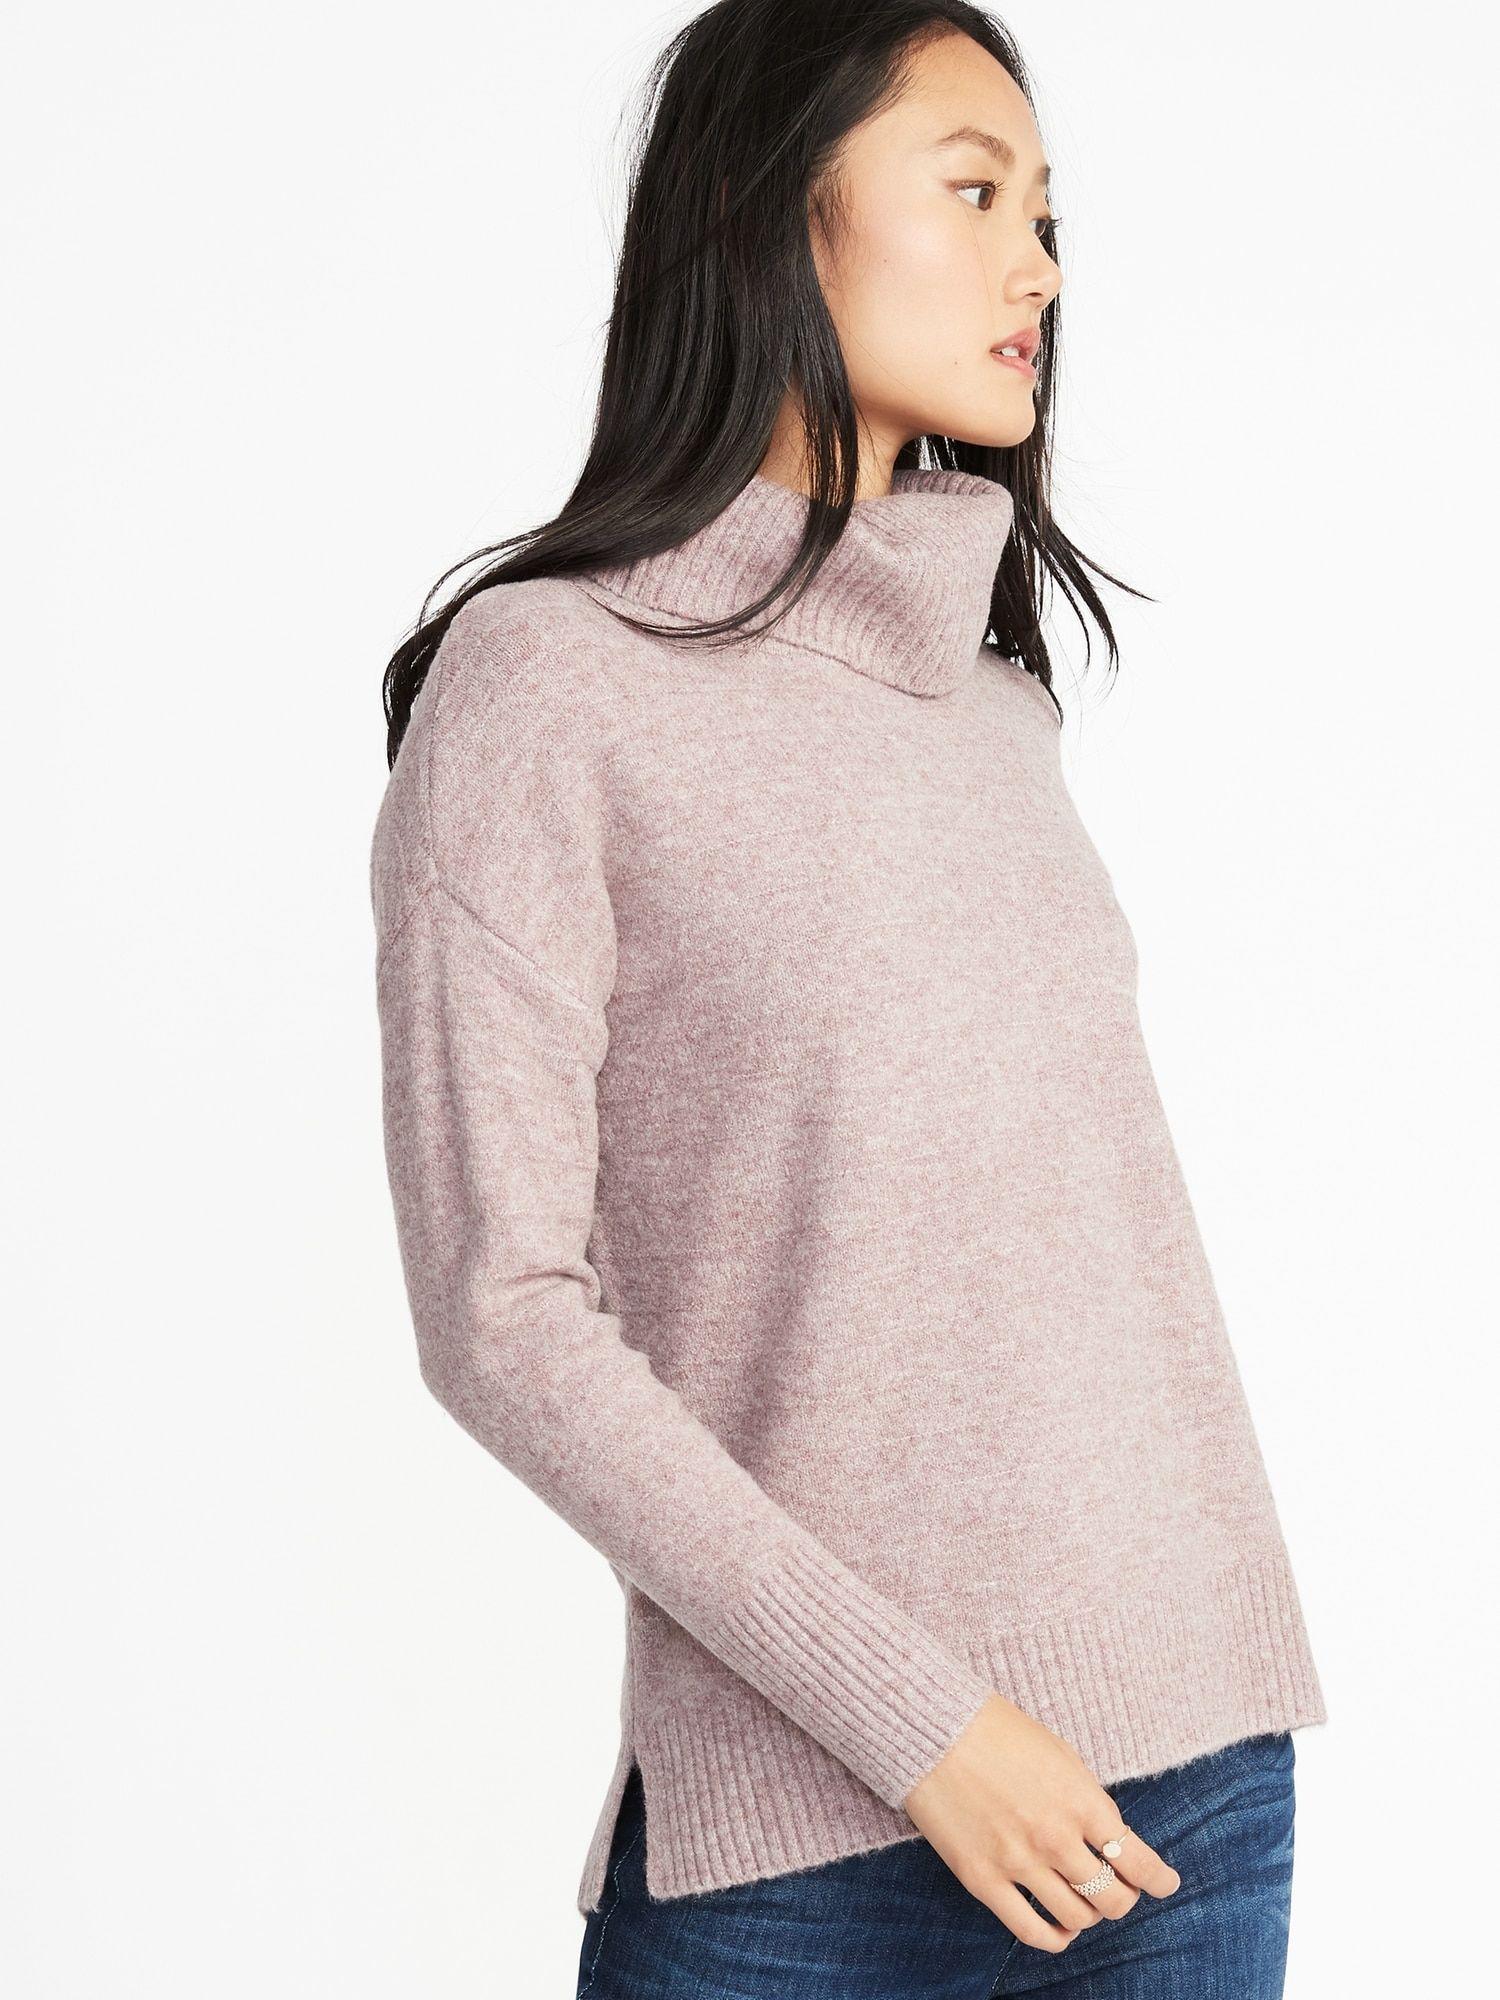 old navy women sweaters